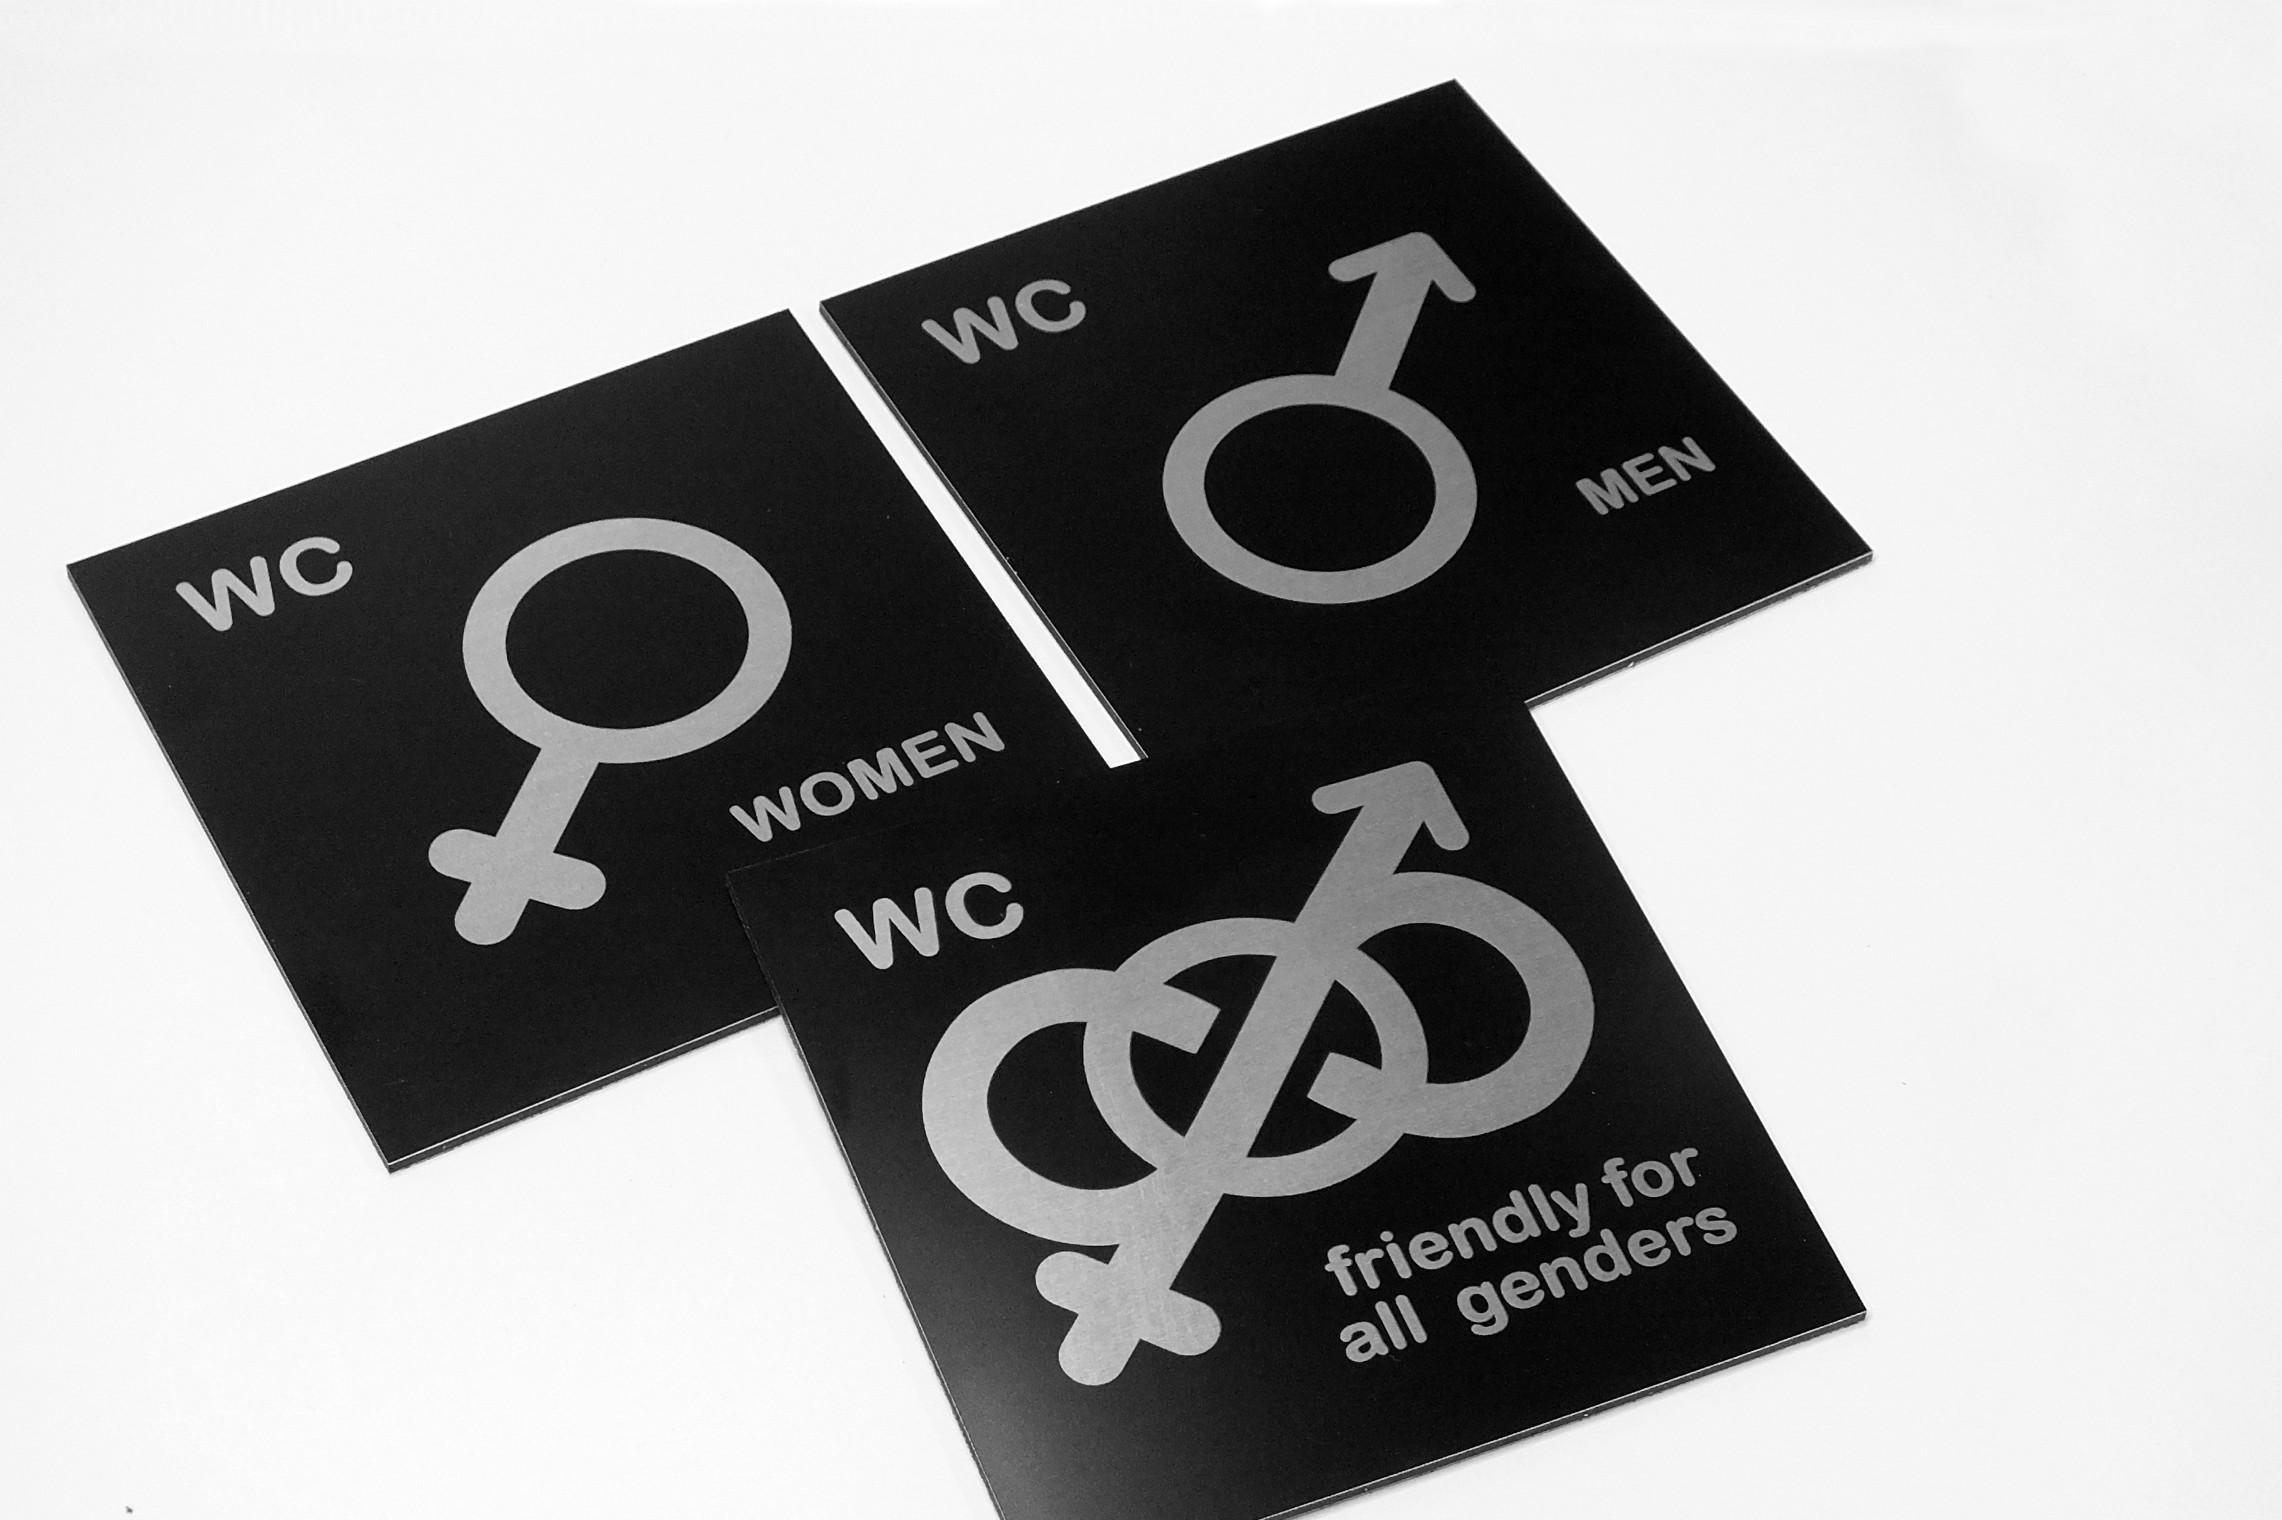 Symbol Tabliczka Wc Toaleta Męska Damska C00 Czarne 3d Eg Numer Numery Na Drzwi Pleksi Dibond Aluminium Dibond Led Reklama Aluminium Piktogramy Wc Grawerka